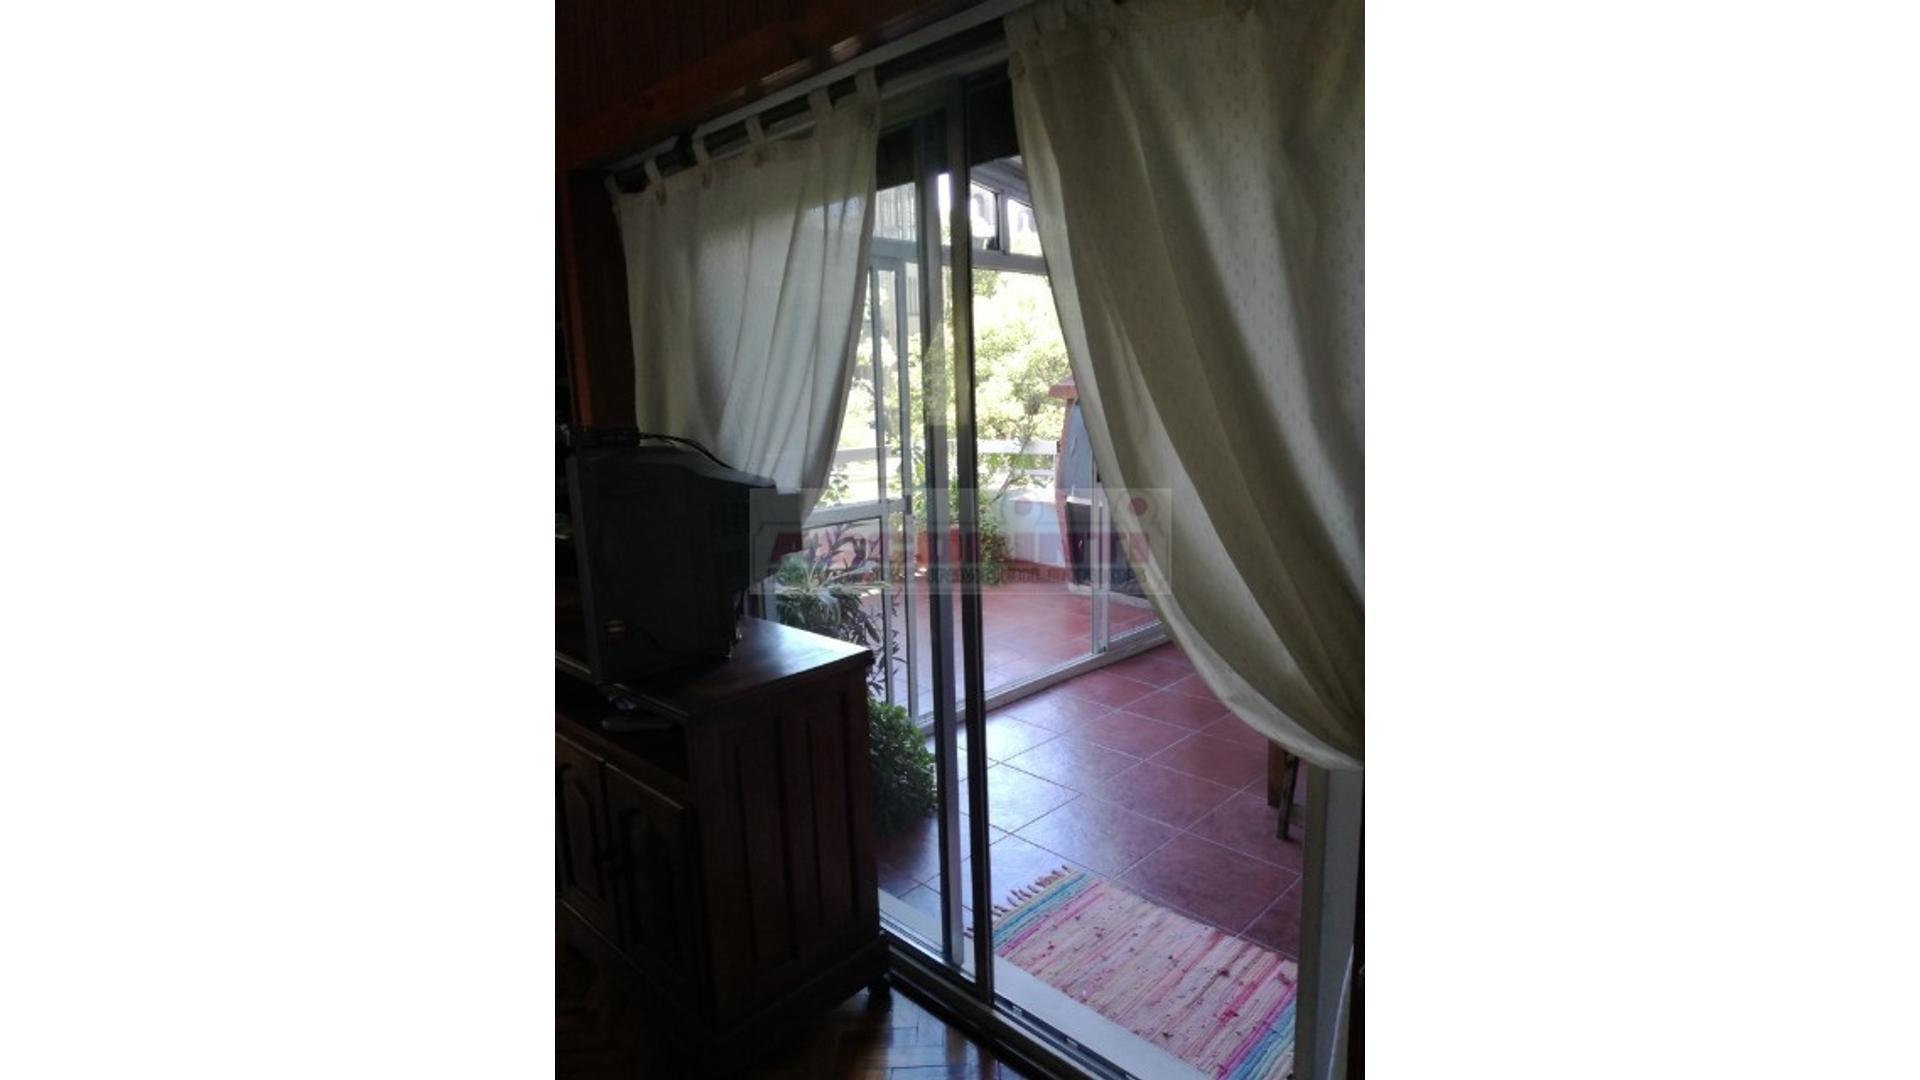 Excelente departamento con balcón terraza con parrila + cochera en Las Cañitas